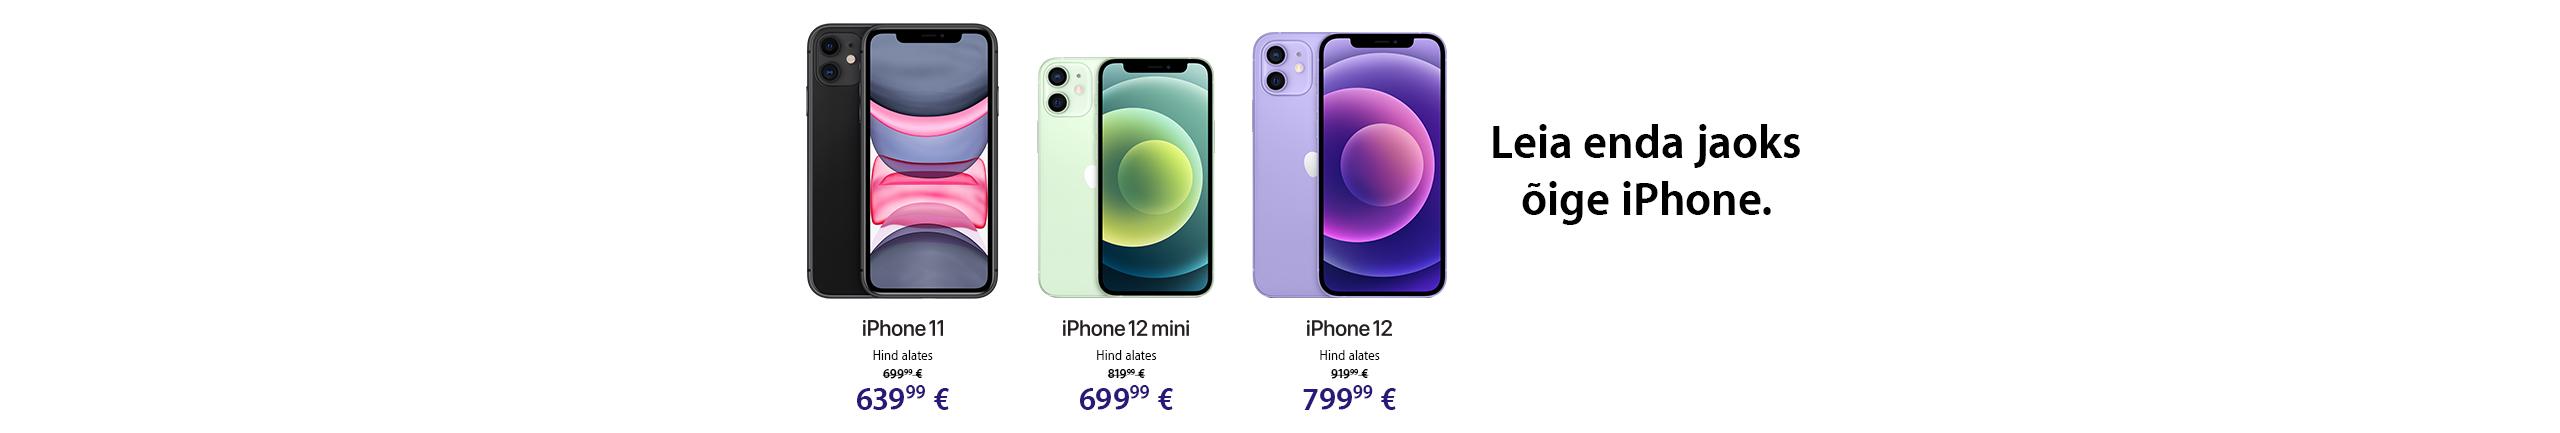 NPL Apple iPhone 11, iPhone 12 ja iPhone 12 mini special offers